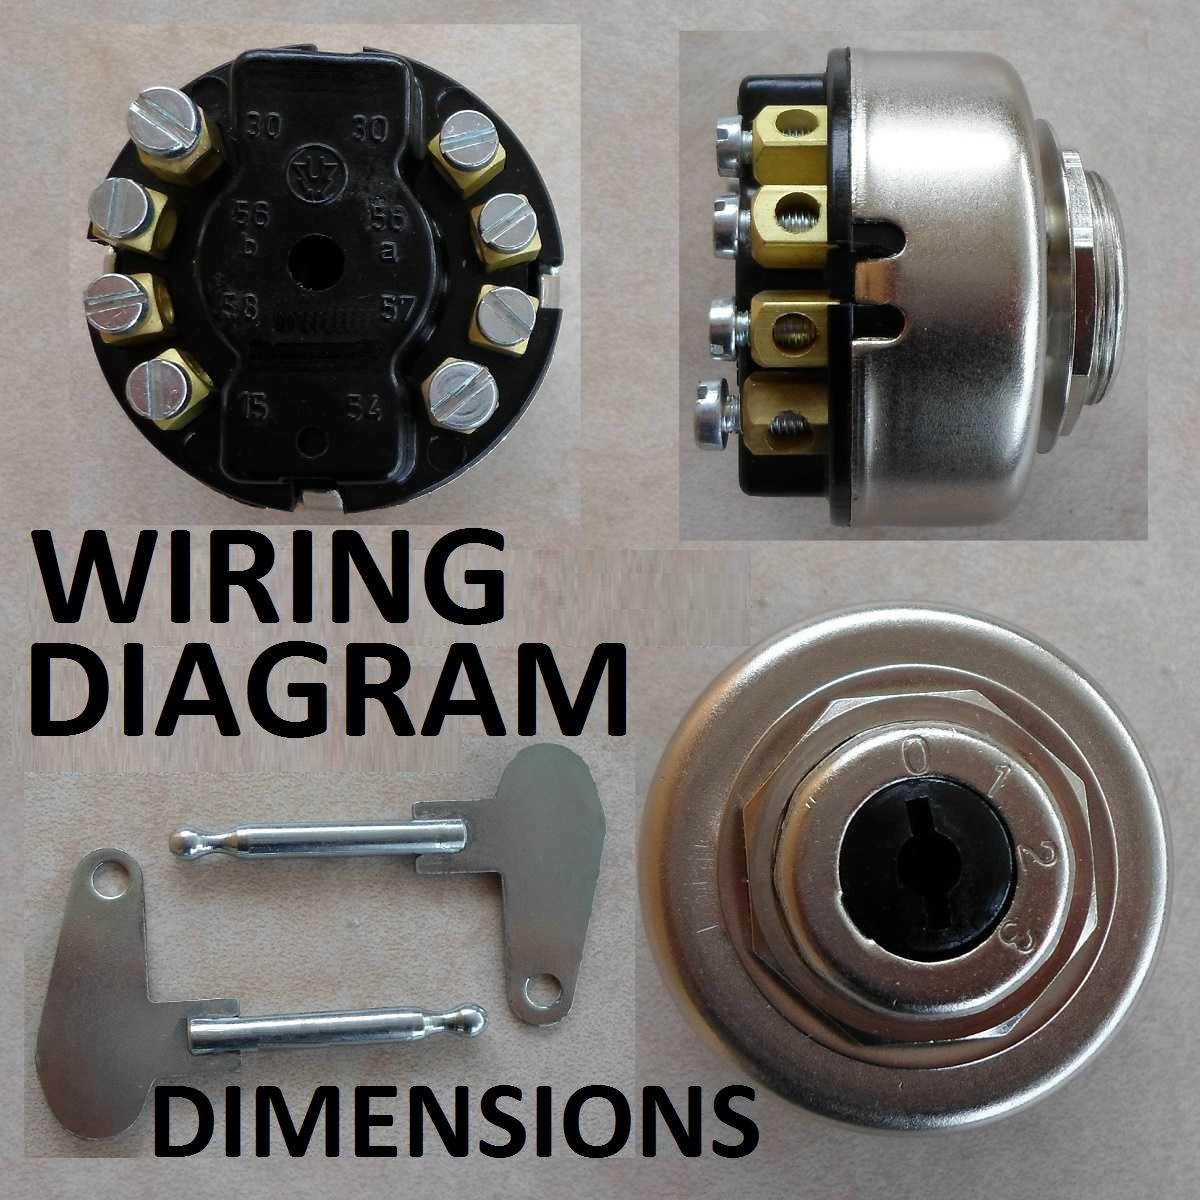 David Brown Spare Parts Reviewmotors Co David Brown 990 Tractor Wiring  Diagram